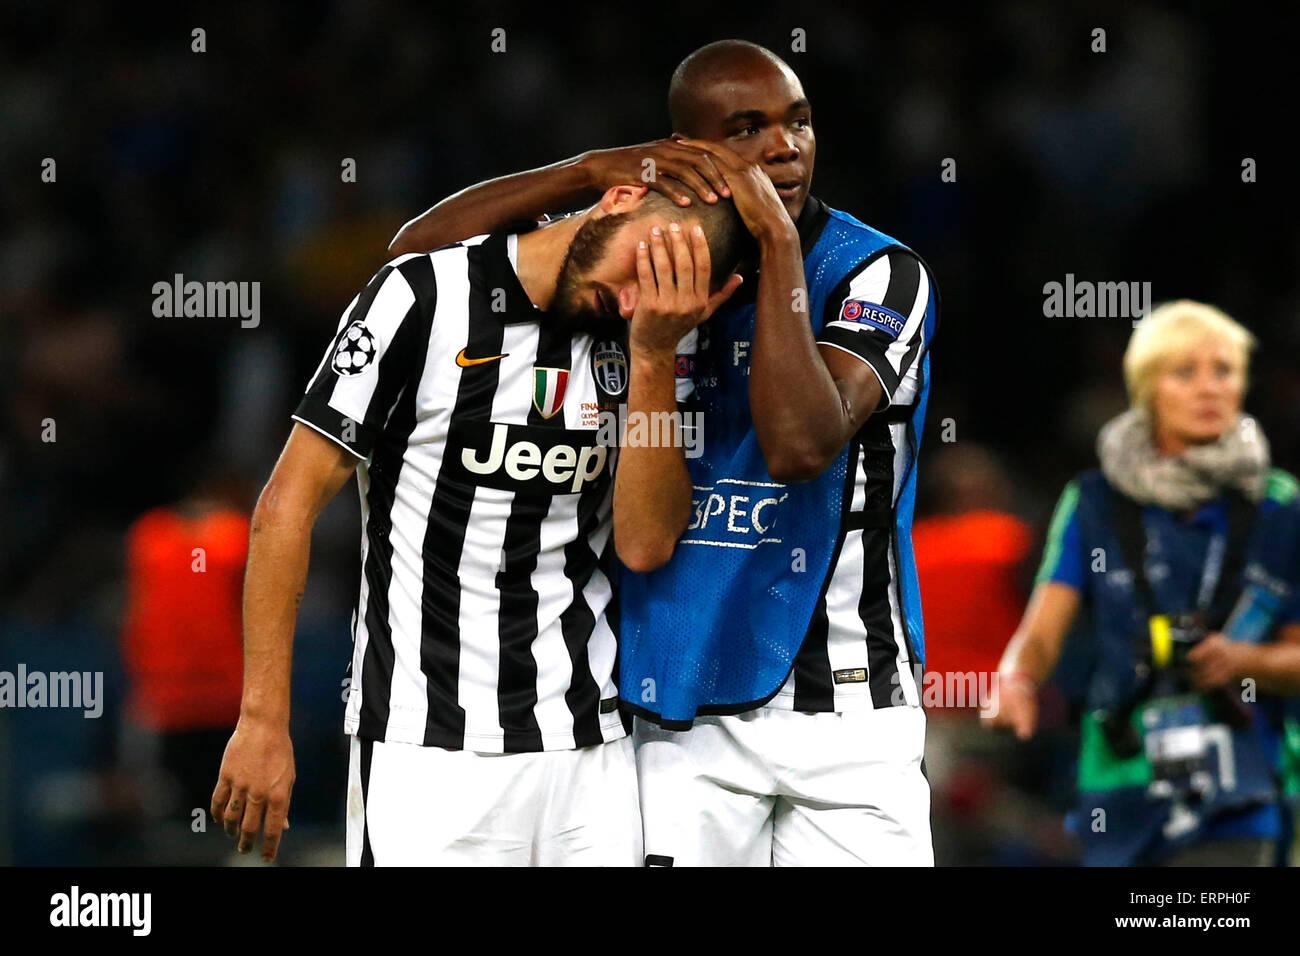 Berlin (Deutschland). 6. Juni 2015. Fußball / Fußball: Uefa Champions League - Finale Juventus Vs Barcellona Stockbild